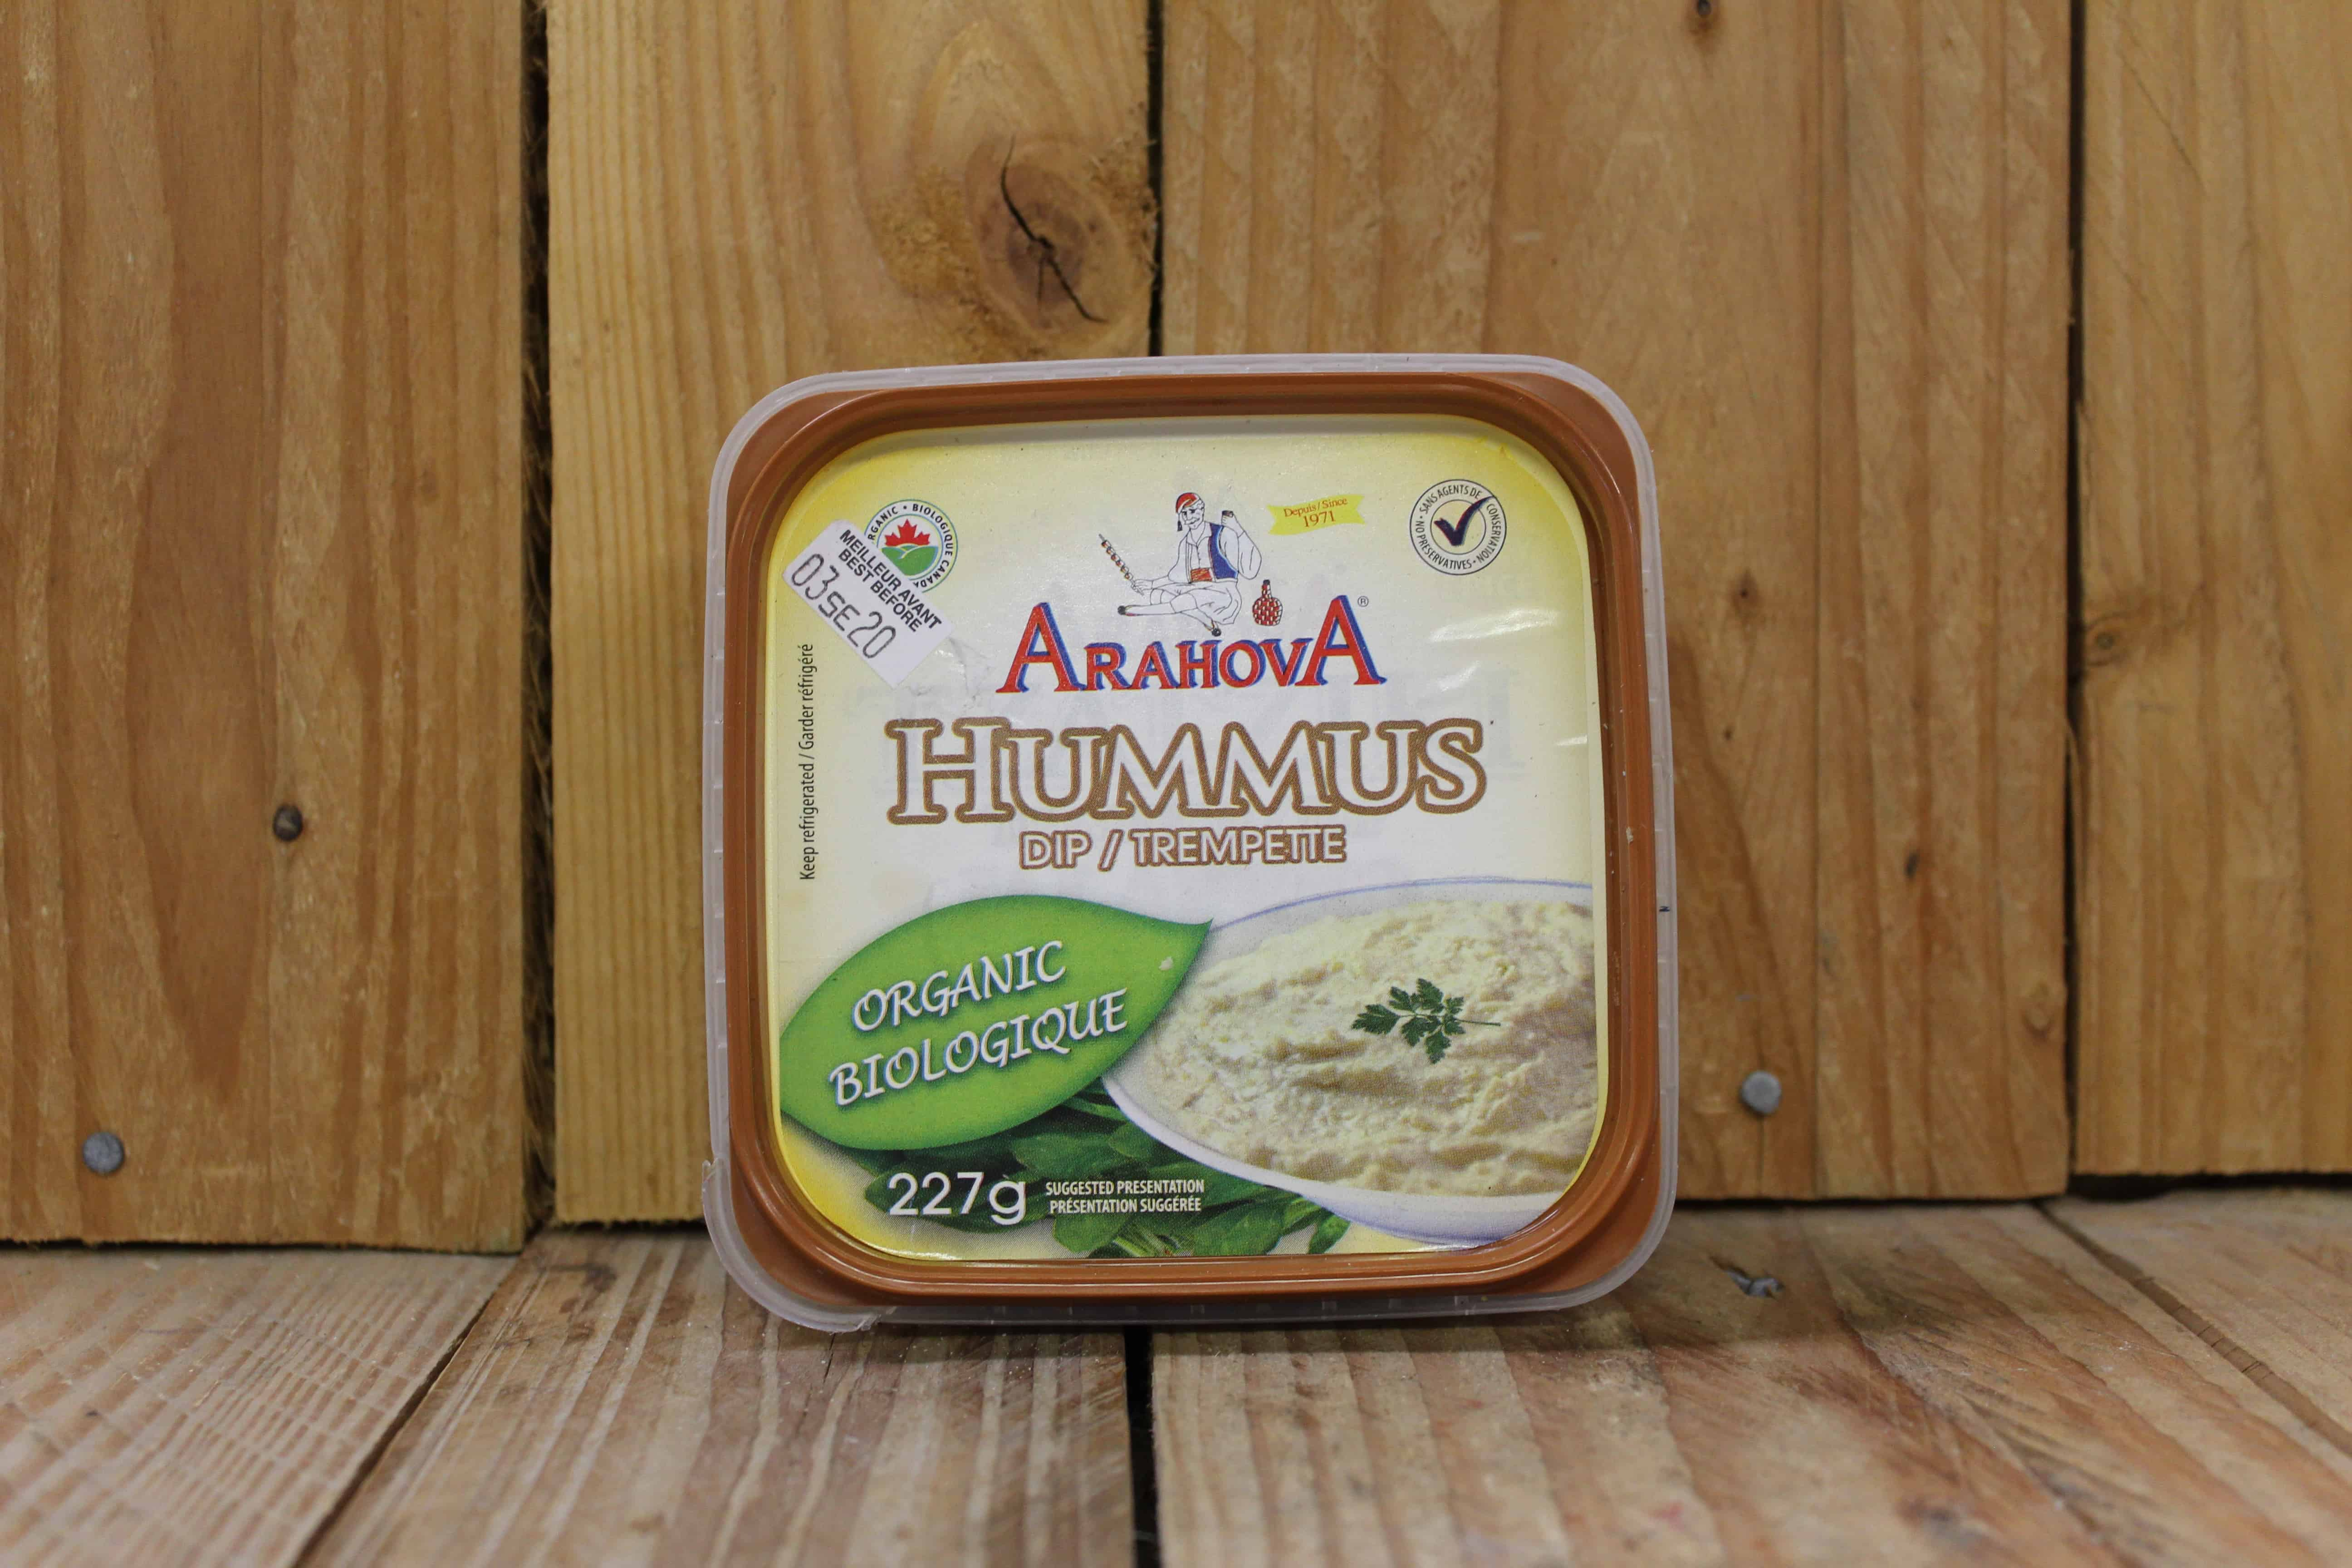 Arahova – Hummus, Classic (227g)